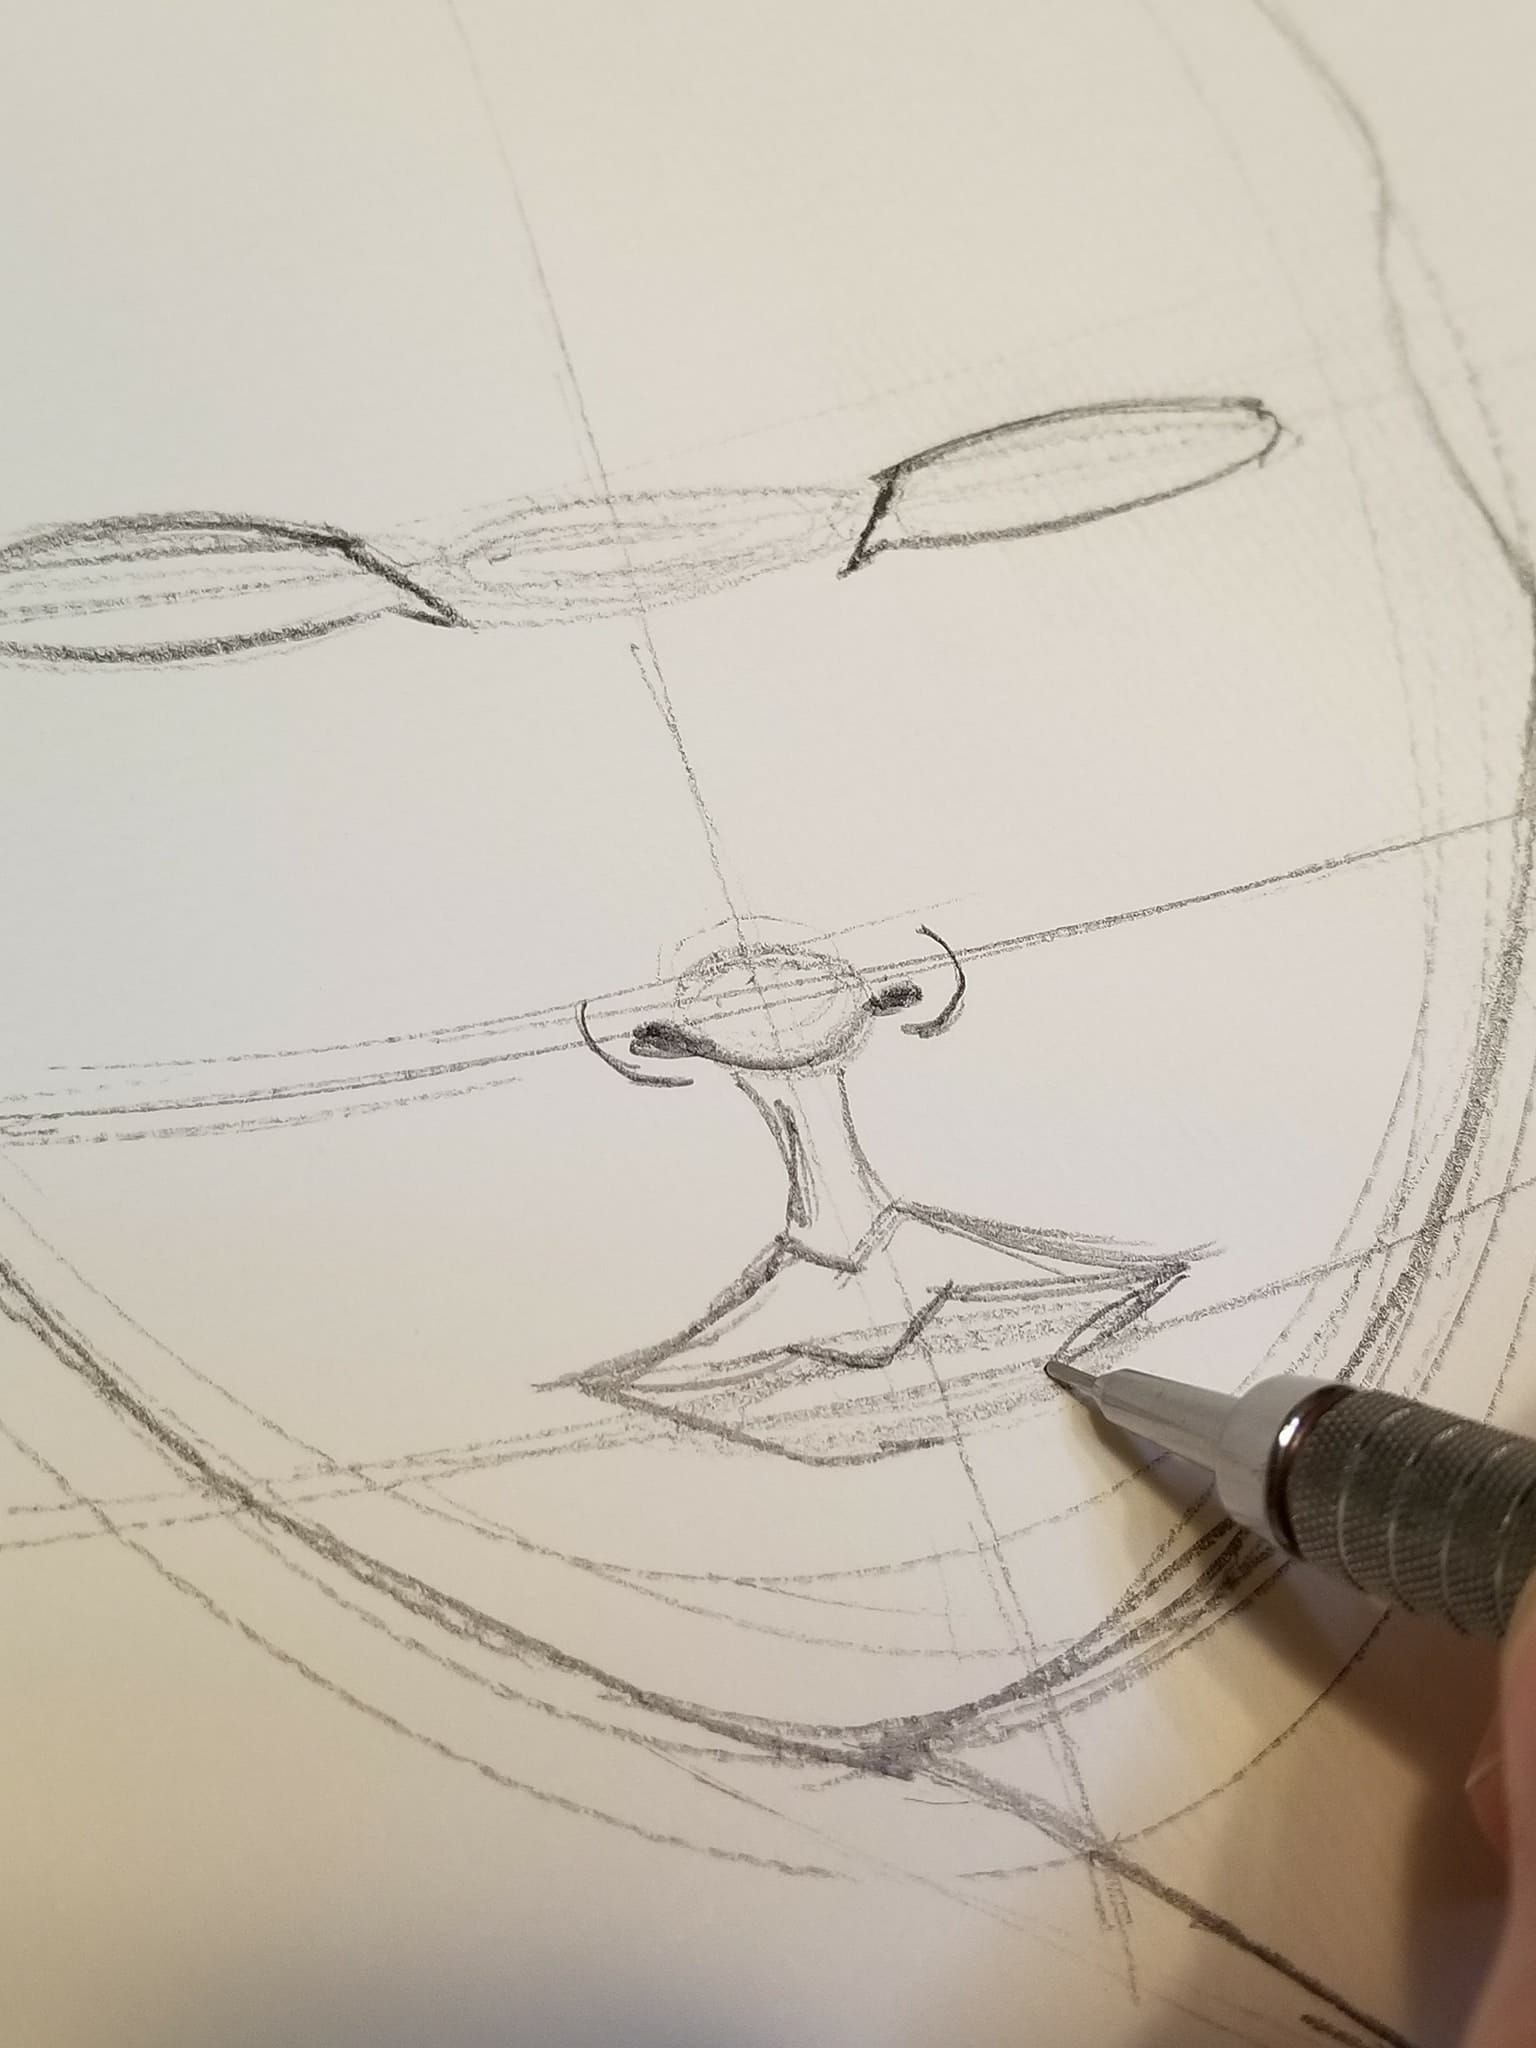 Basic Face Drawing | Pencil drawing tutorials, Art ...